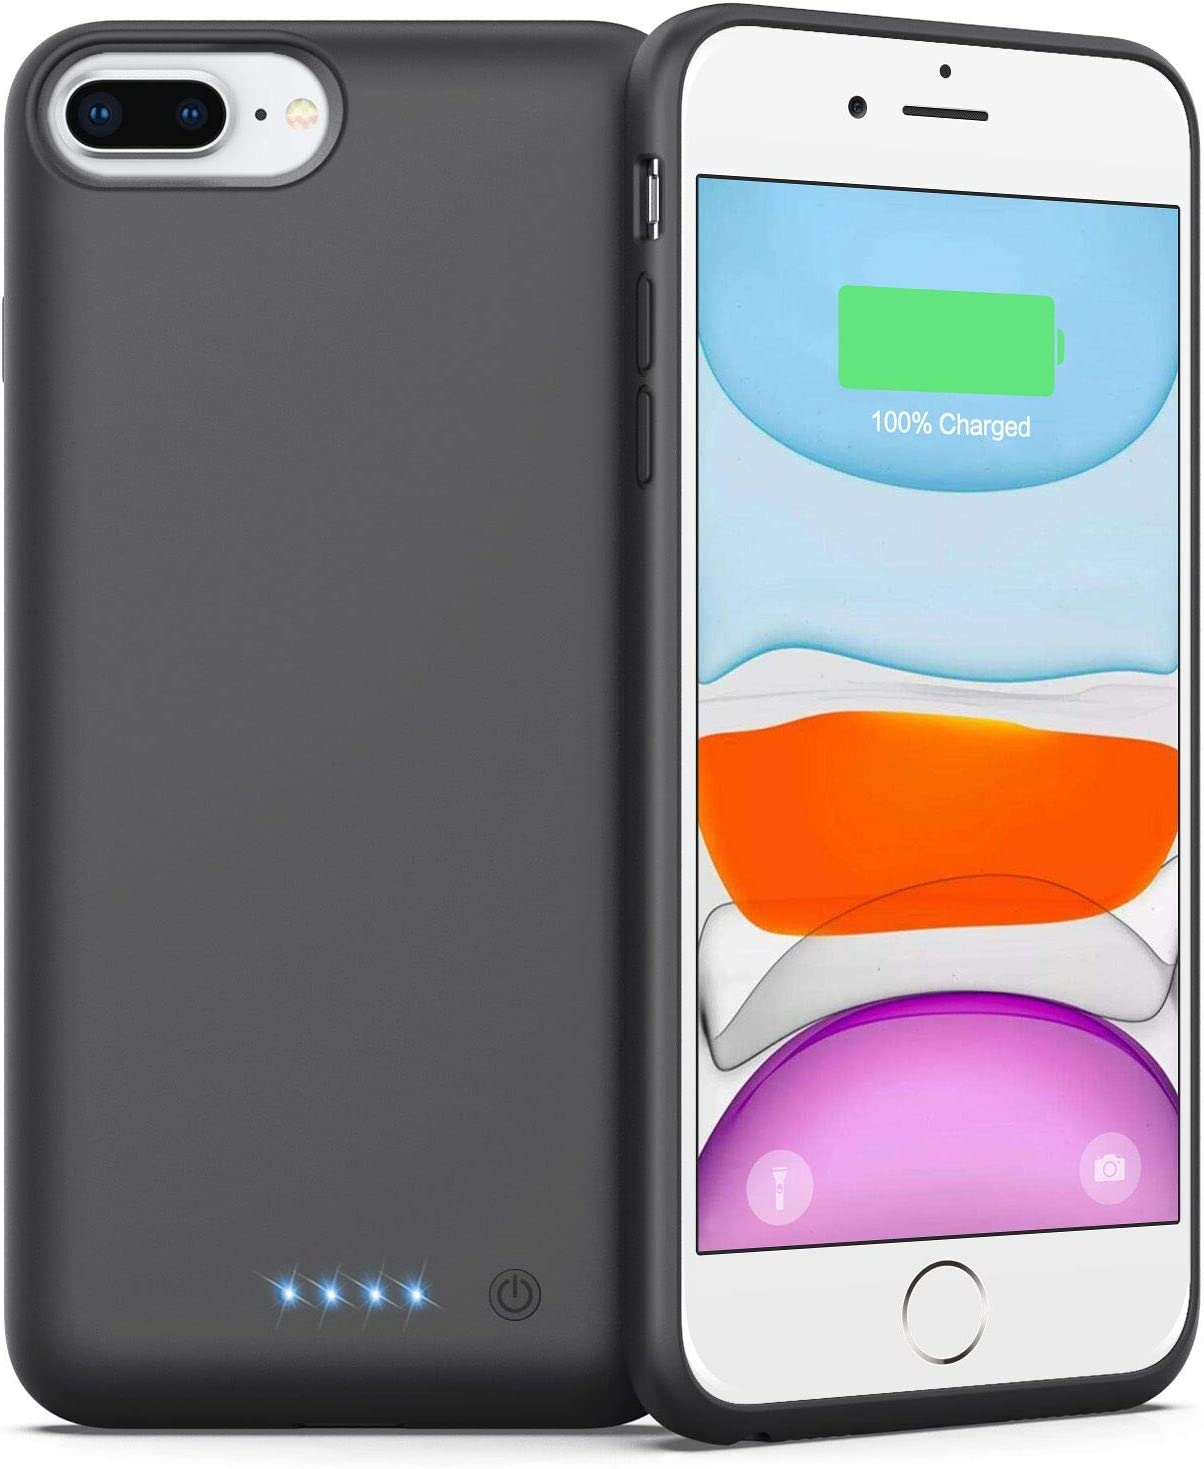 Battery Case for iPhone 6 Plus/ 7 Plus/ 8 Plus, (Newest 8500mAh) External Battery Pack Protective Portable Phone Charger for iPhone 7 Plus/ 8 Plus Rechargeable Battery Case - 5.5 inch Black